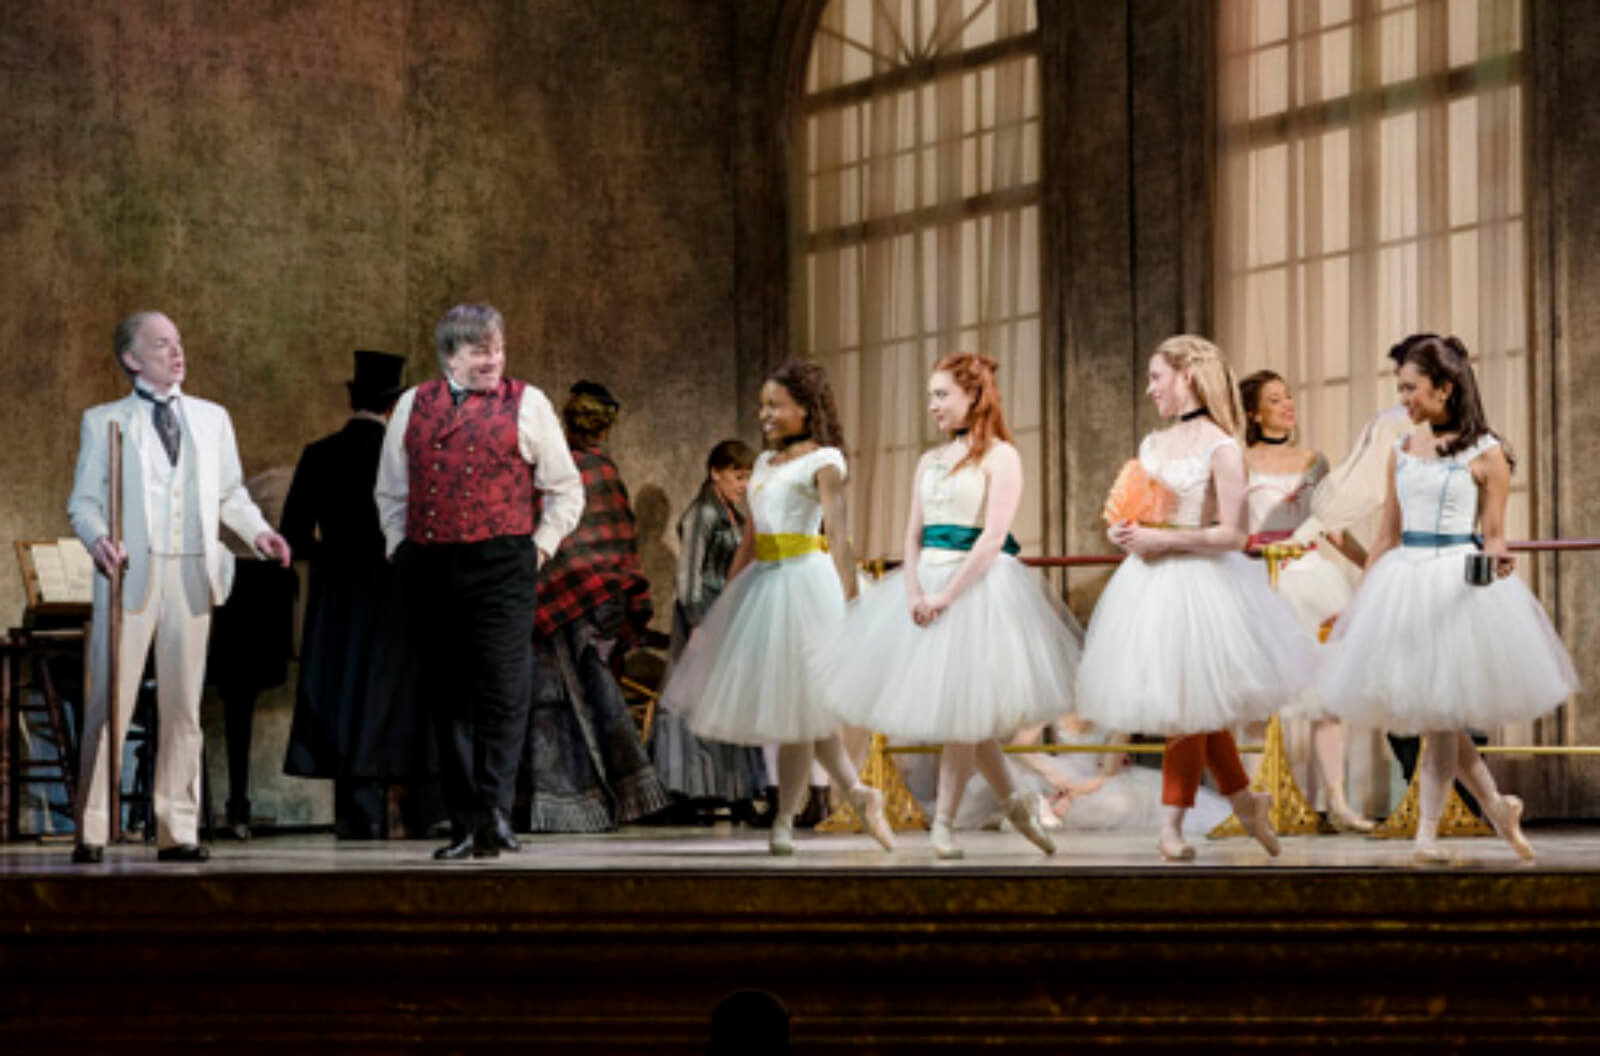 Christopher Gurr, Jimmy Borstelmann and young dancers in ballet class scene from Little Dancer.